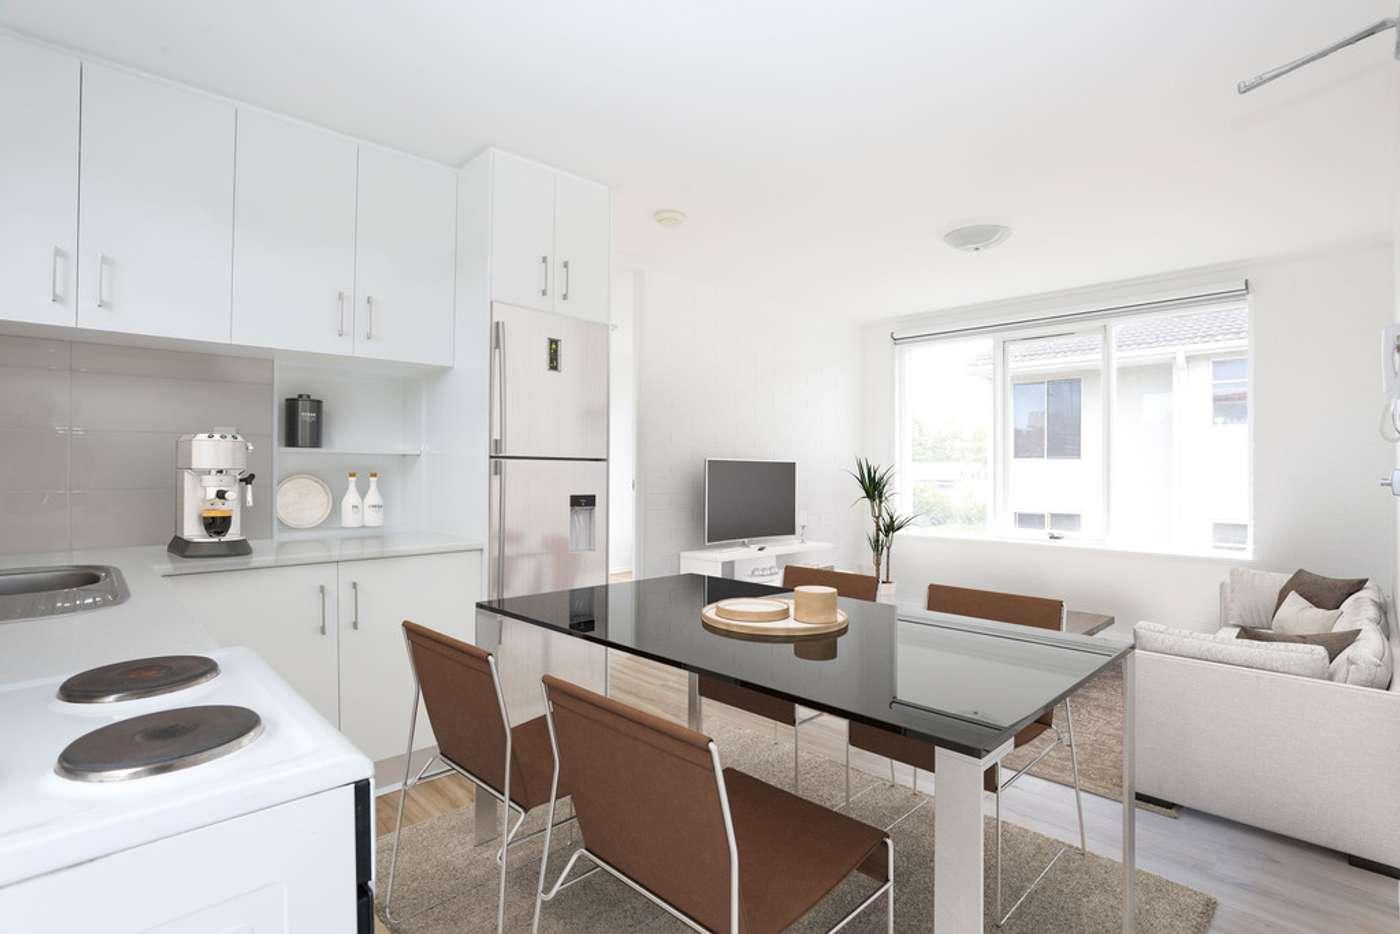 Main view of Homely apartment listing, 5/7 Dartford Street, Flemington VIC 3031